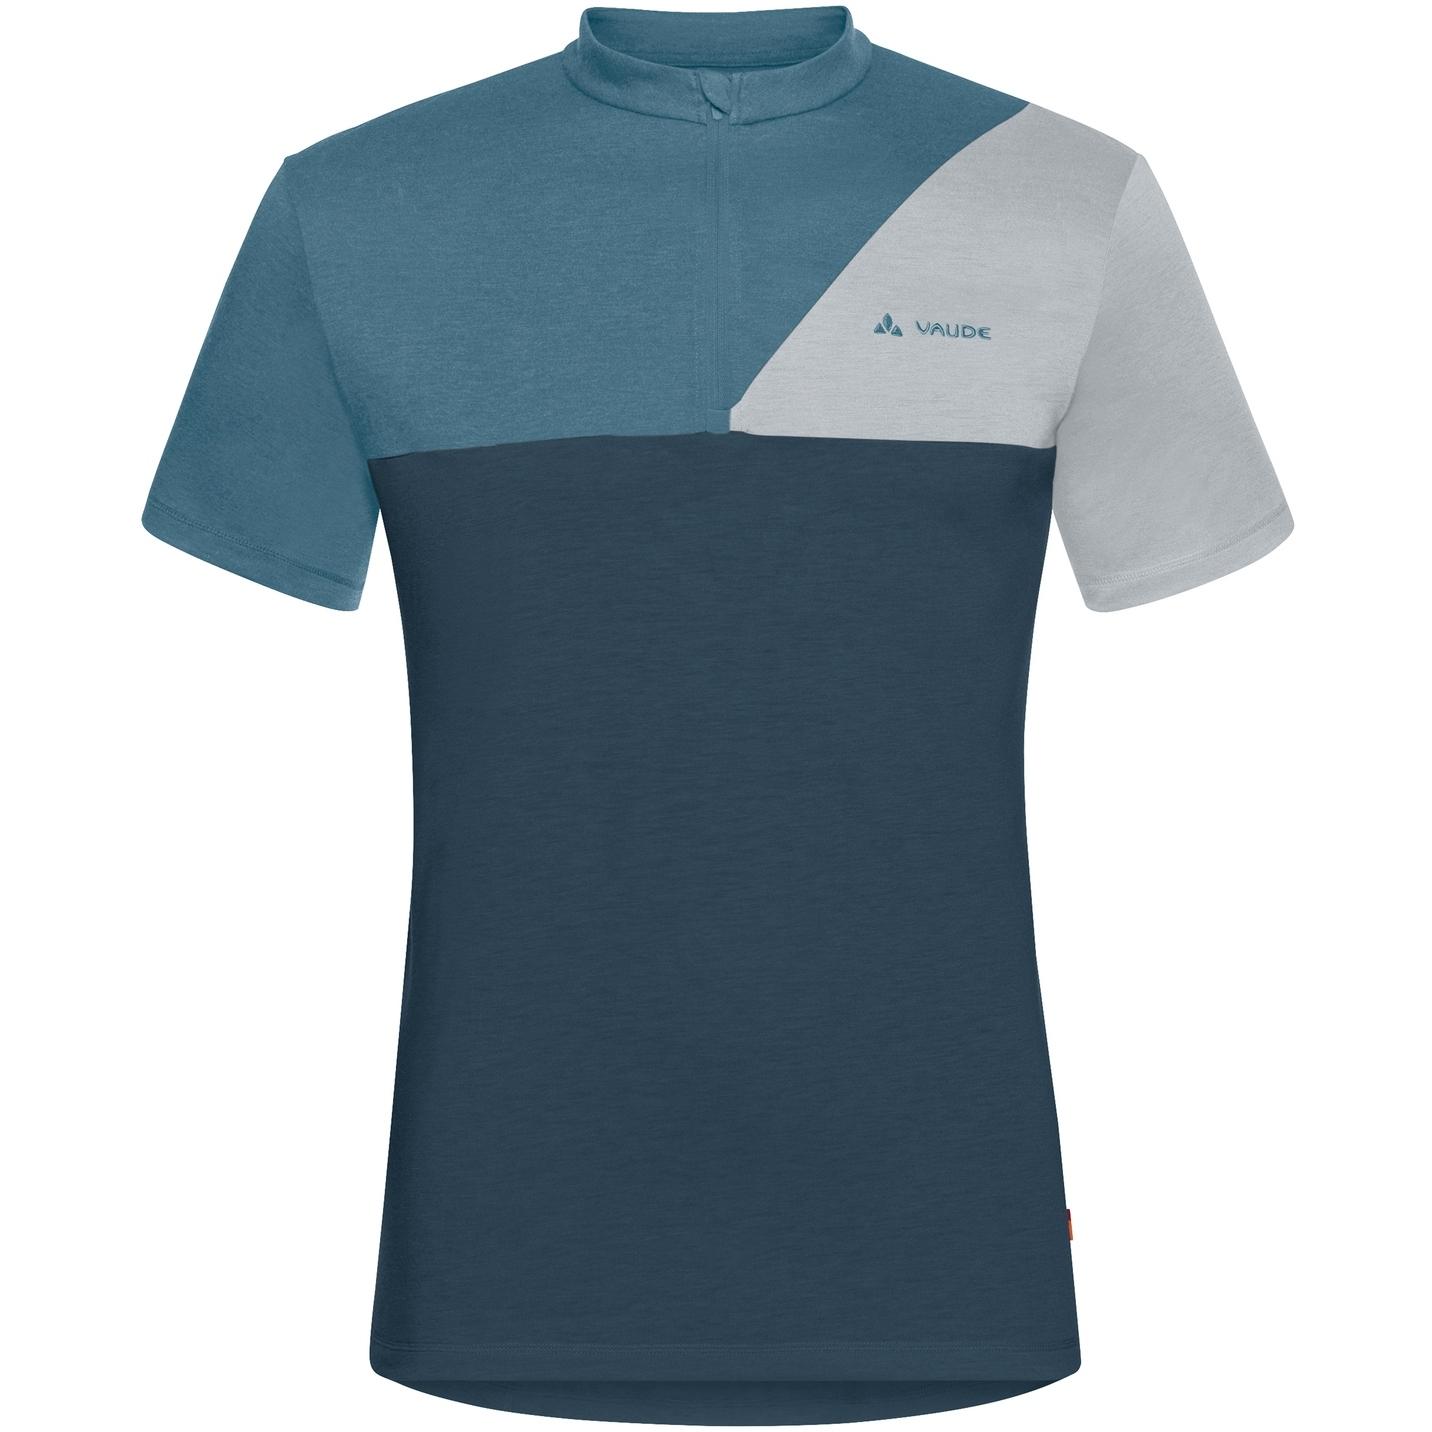 Vaude Tremalzo Shirt IV - steelblue